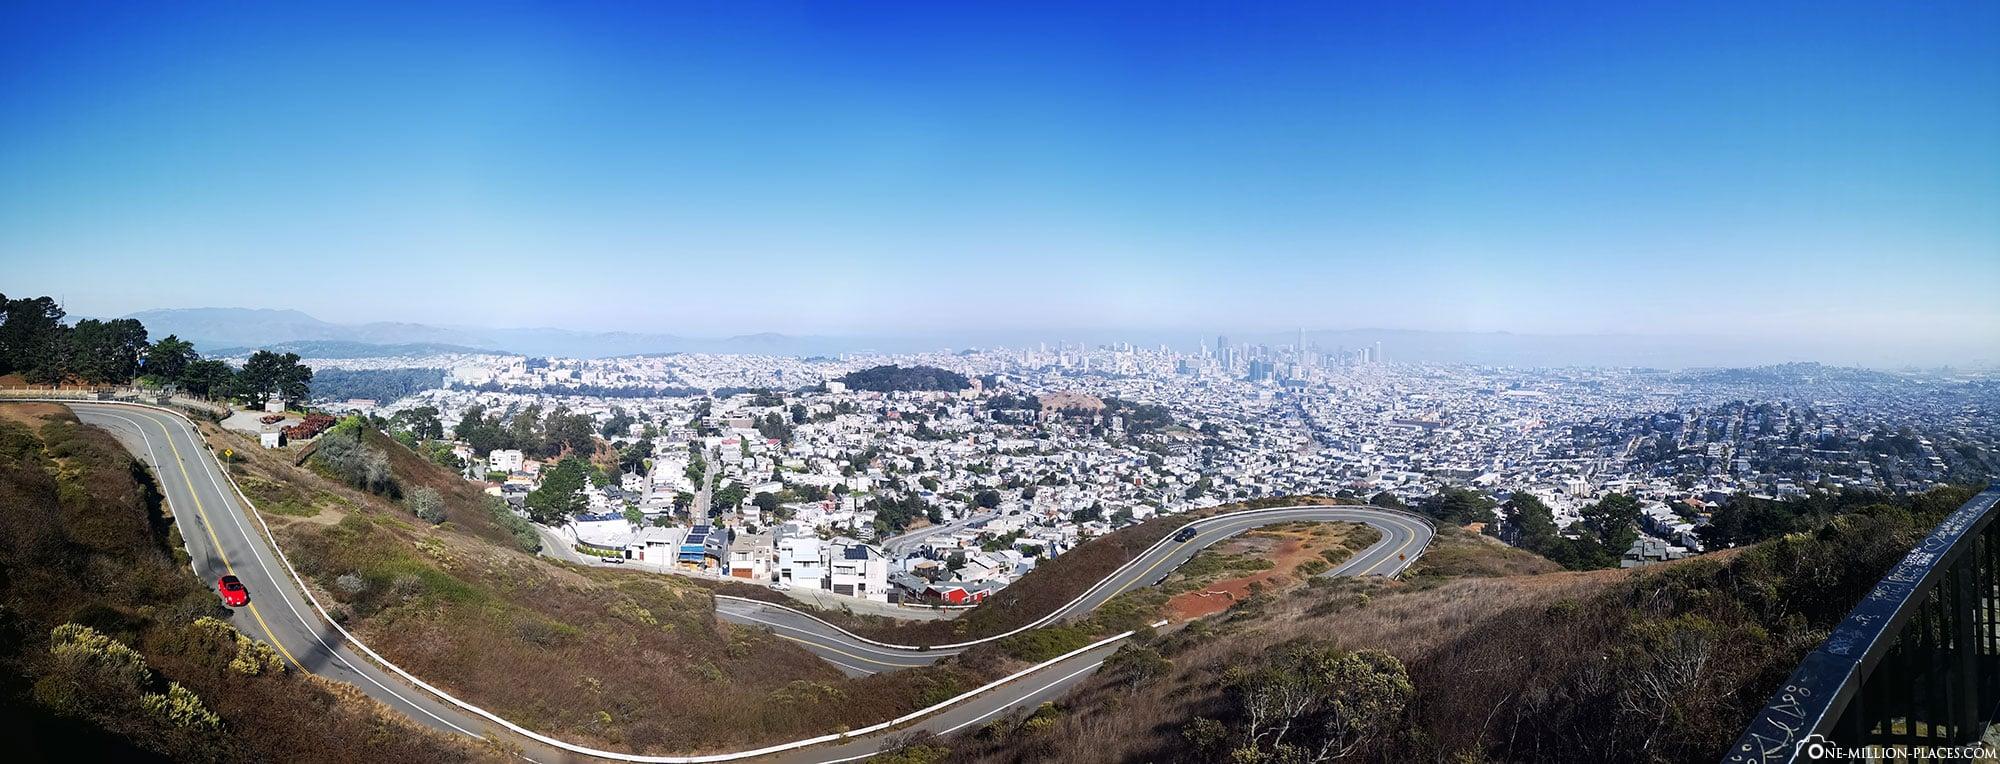 Twin Peaks, panoramic photo, view, views of San Francisco, sights